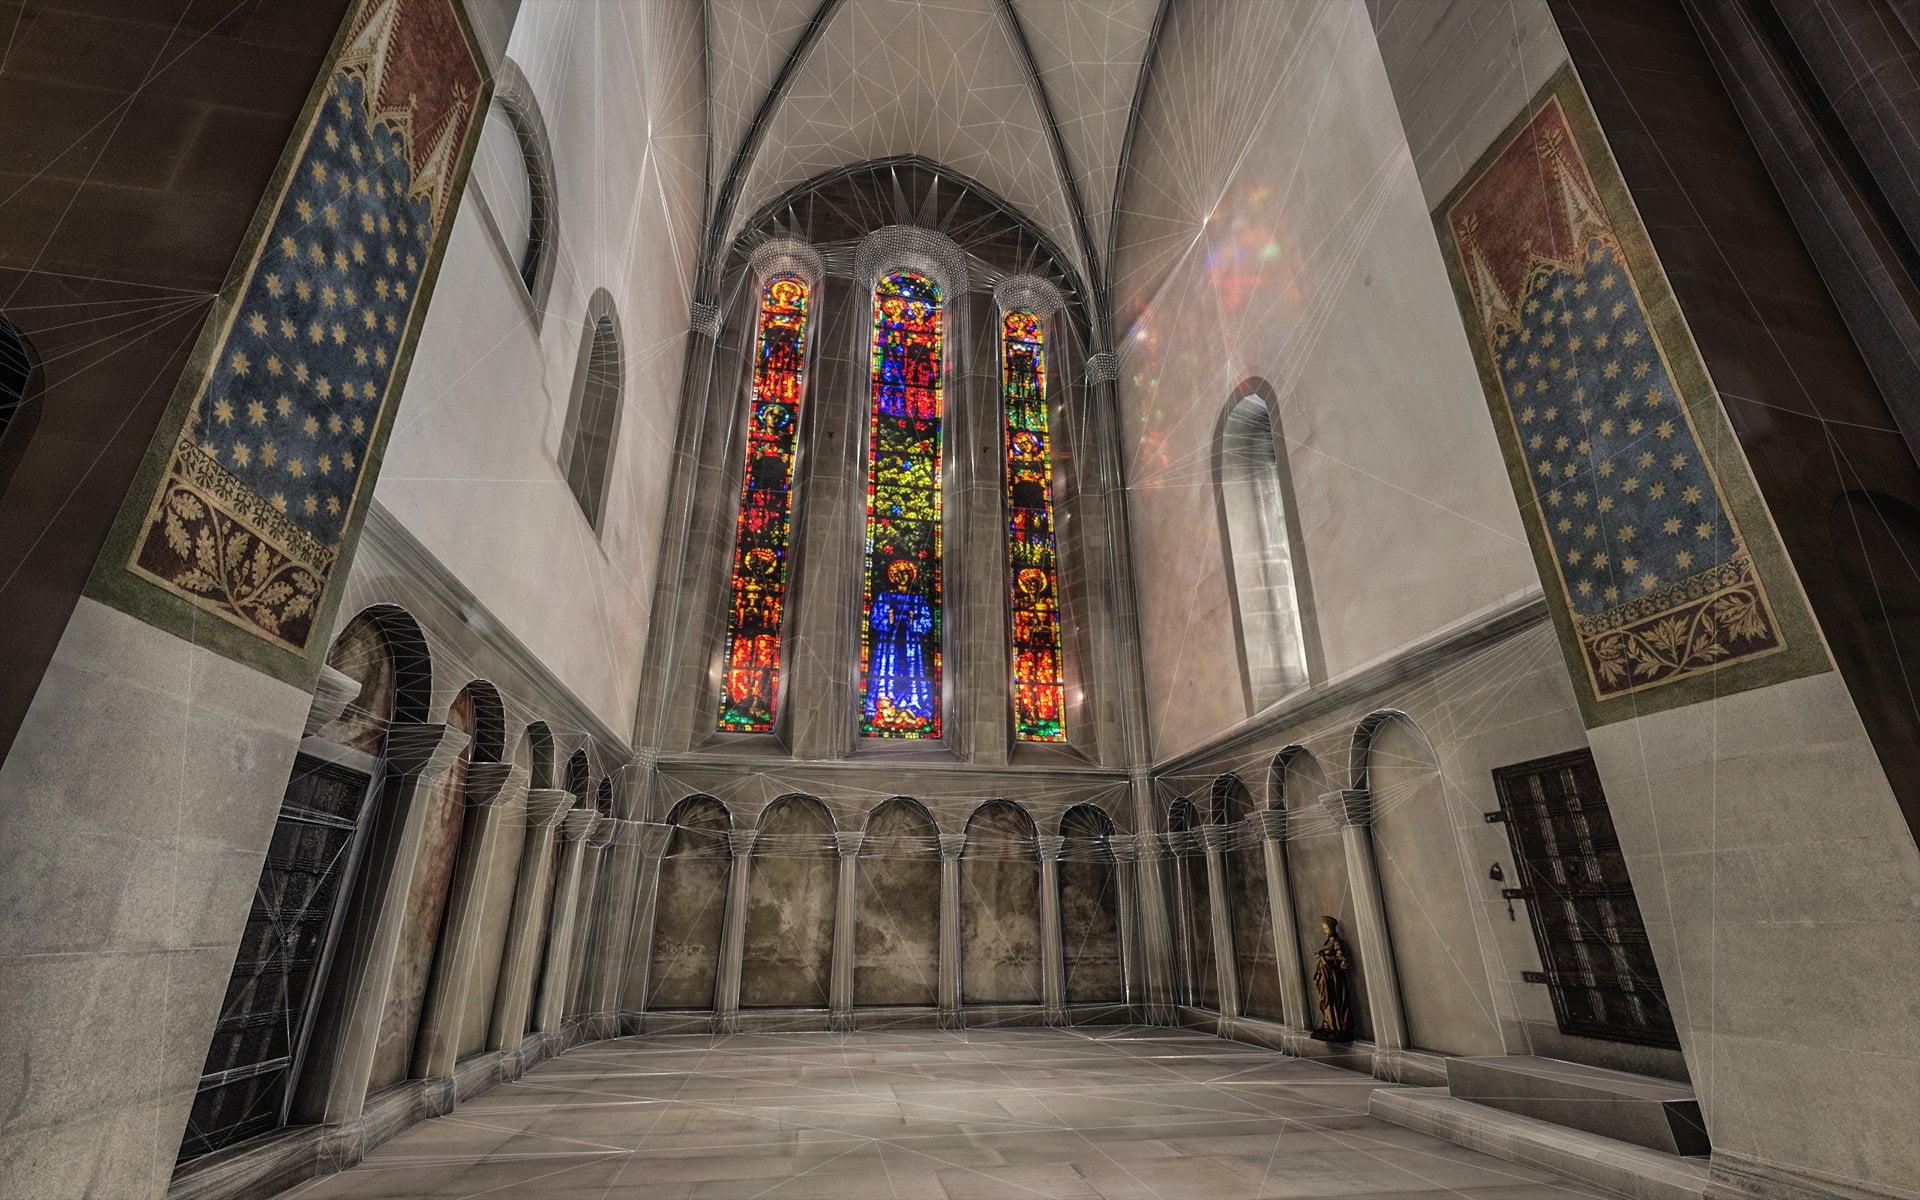 Zwingli, #ZwingliVR, Photogrammetrie, Reformation, ikonaut